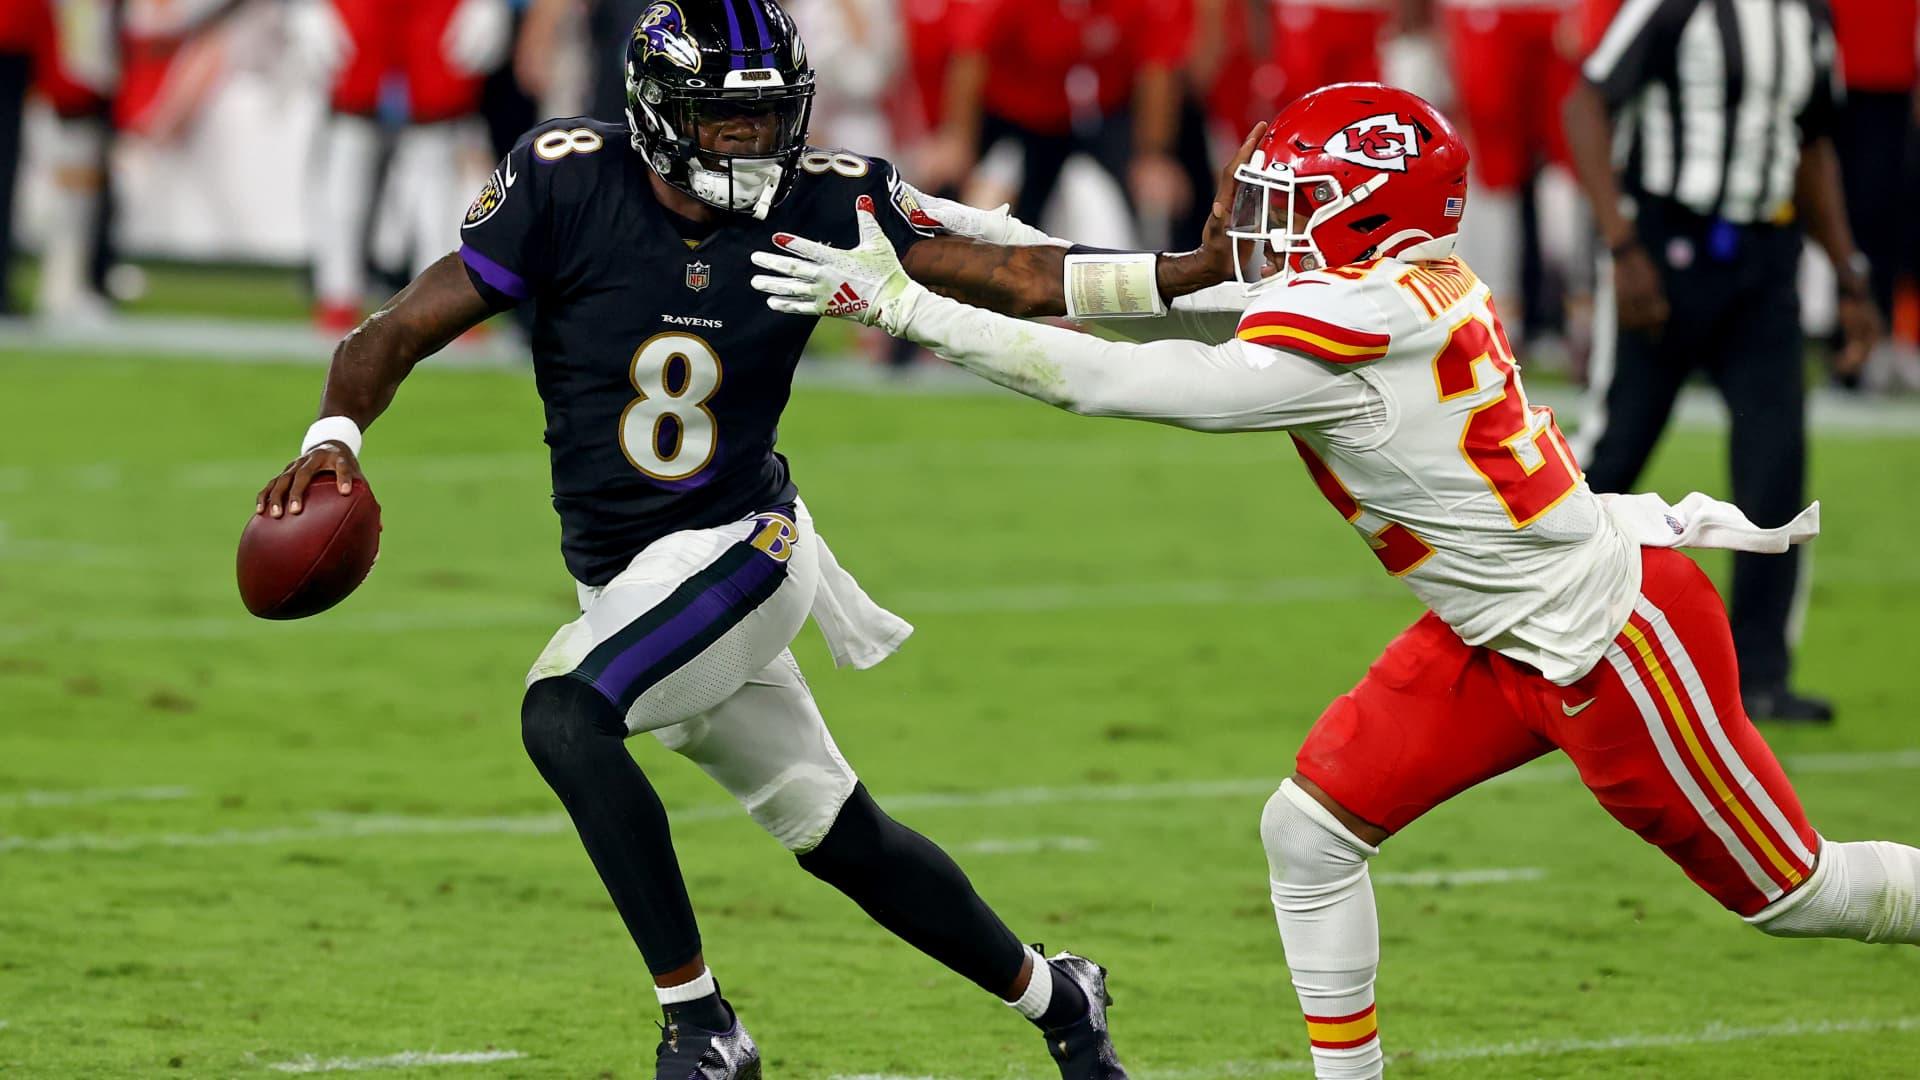 Lamar Jackson of the Baltimore Ravens, left, stiff arms the Kansas City Chiefs' Juan Thornhill at Baltimore's M&T Bank Stadium on Sept. 28, 2020.